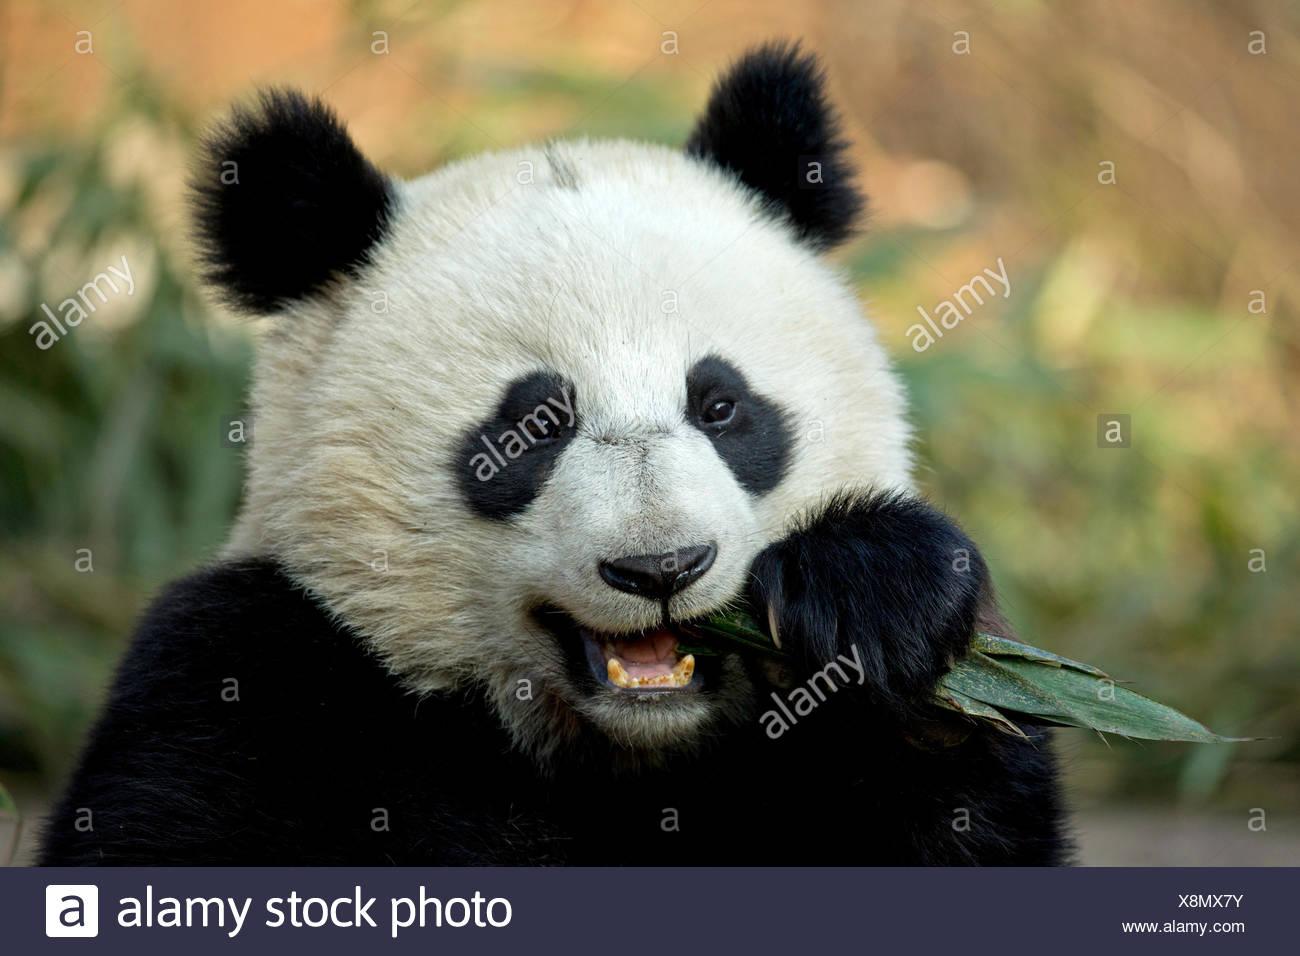 Panda gigante (Ailuropoda melanoleuca) sub adulto alimentazione. Bifengxia, Cina. Captive. Foto Stock